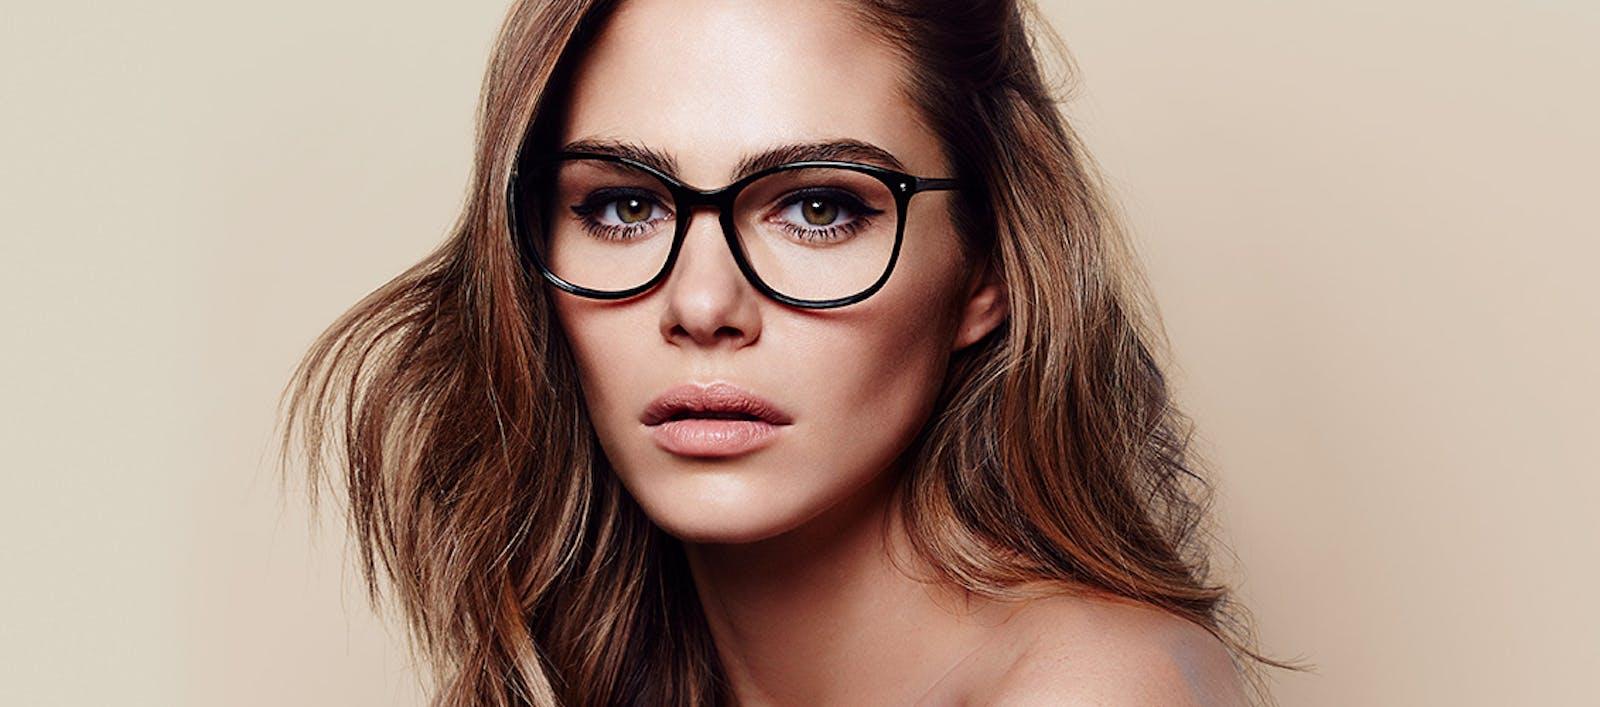 c31c85d5b51 Affordable Fashion Glasses Rectangle Square Round Sunglasses Women Nadine  Pitch Black